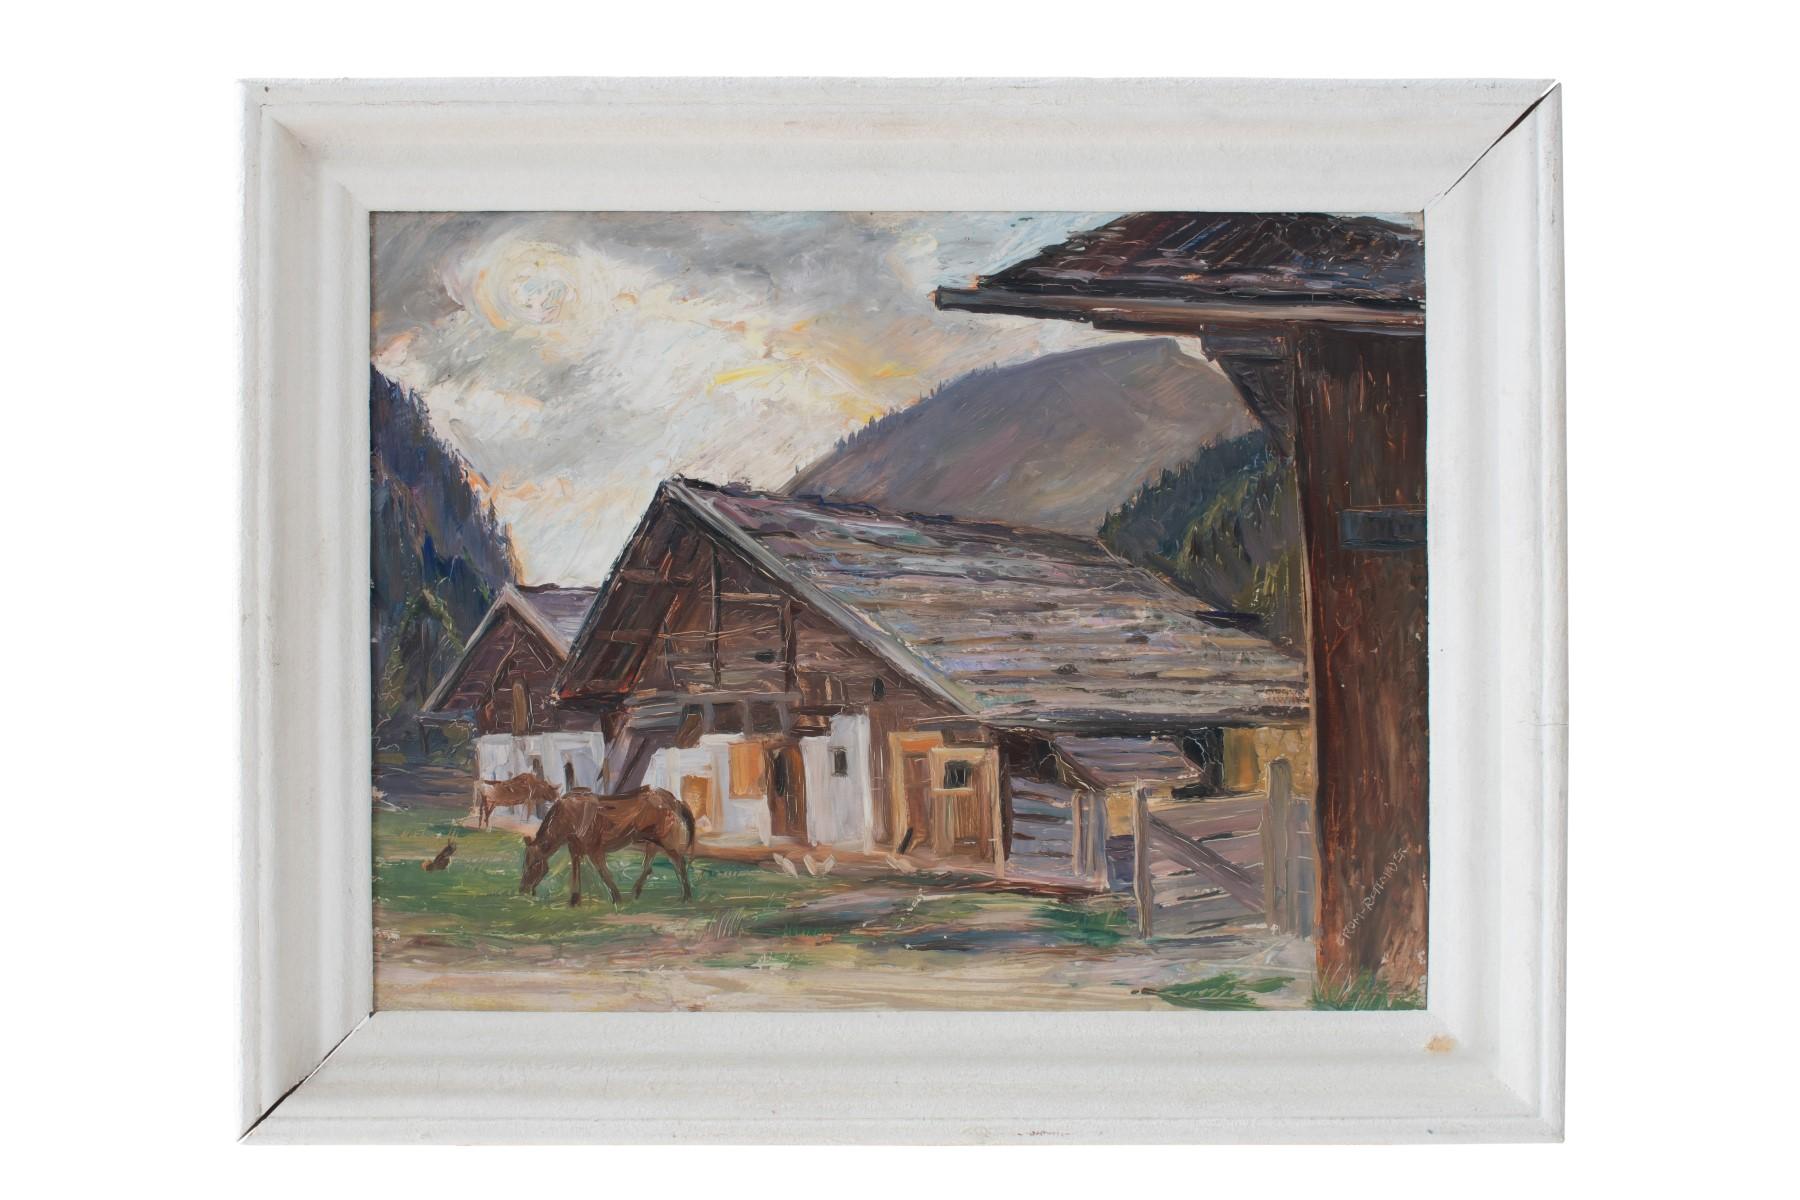 #57 Hermann Grohm-Rottmayer (1877-1953), Farmstead   Hermann Grohm-Rottmayer (1877-1953), Bauerngehöft Image